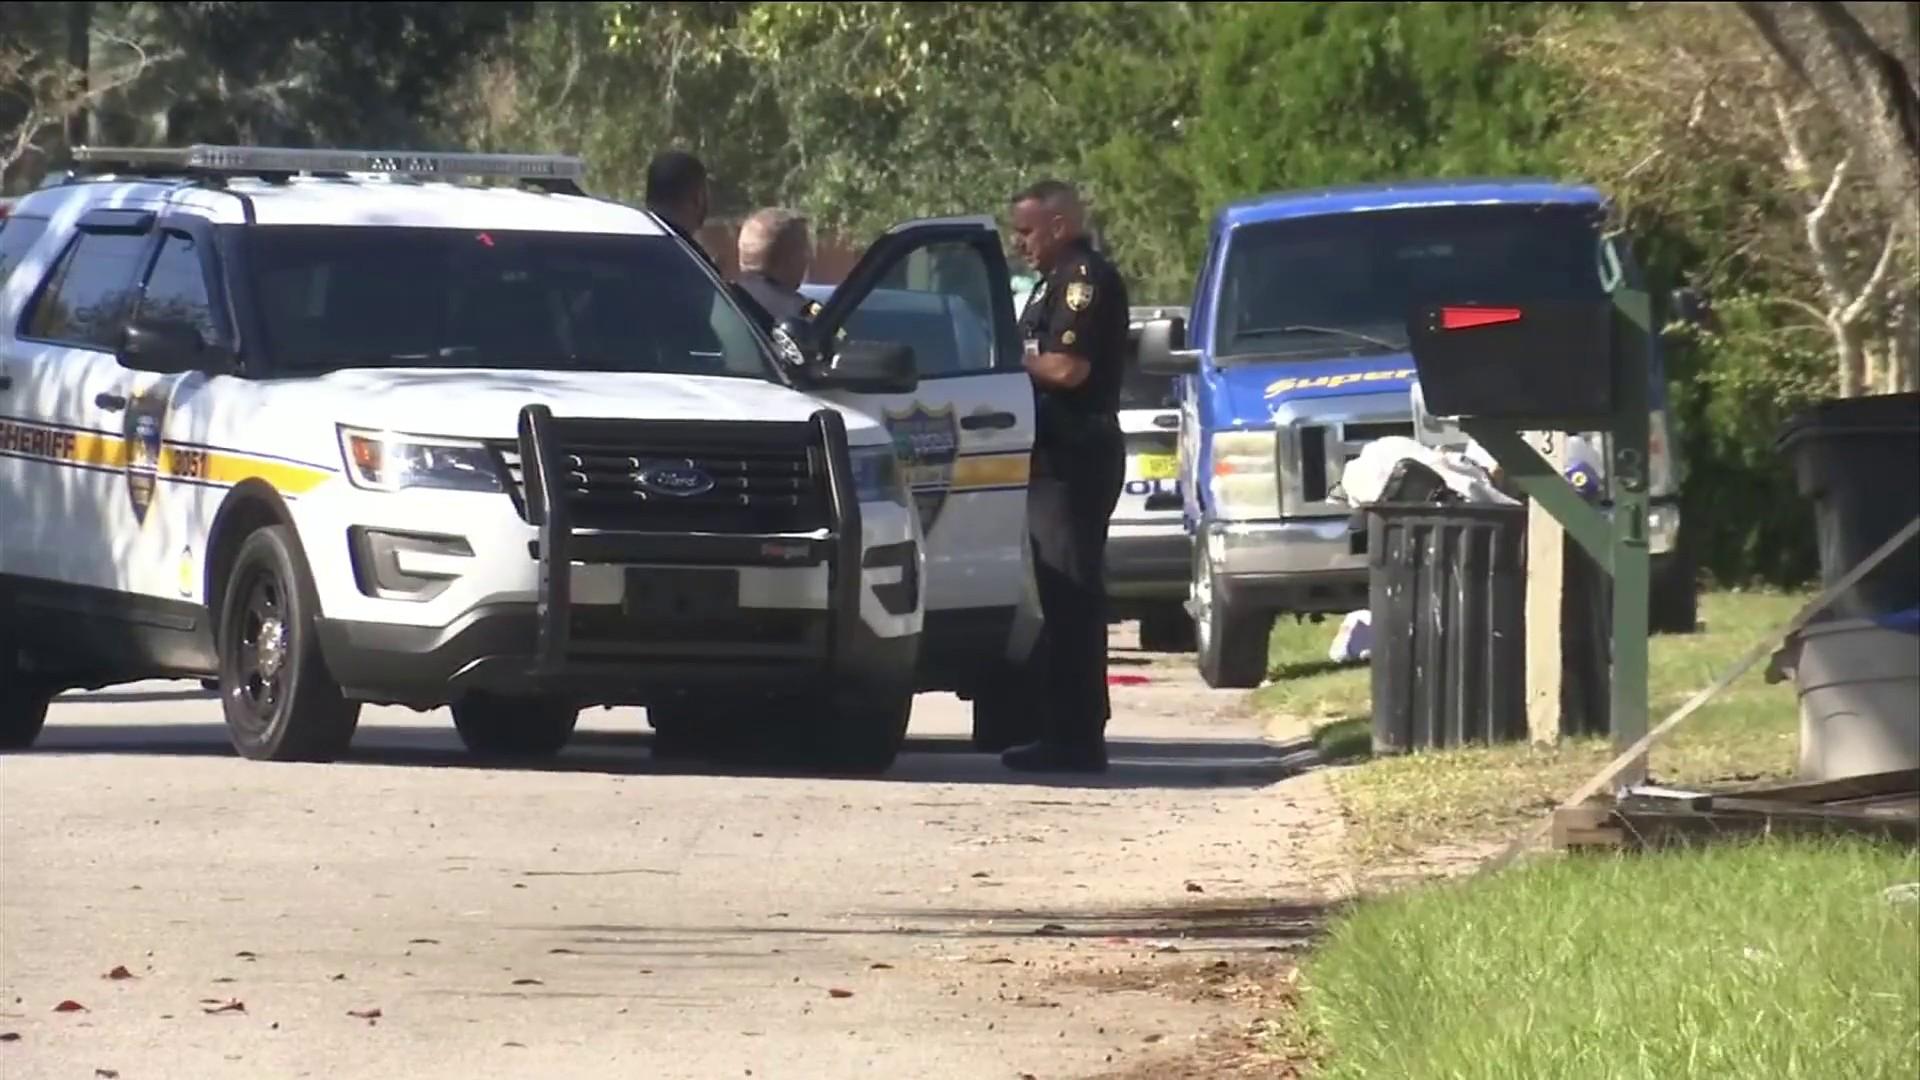 Number of homicides, shootings grow as violence spills across Jacksonville - WJXT News4JAX